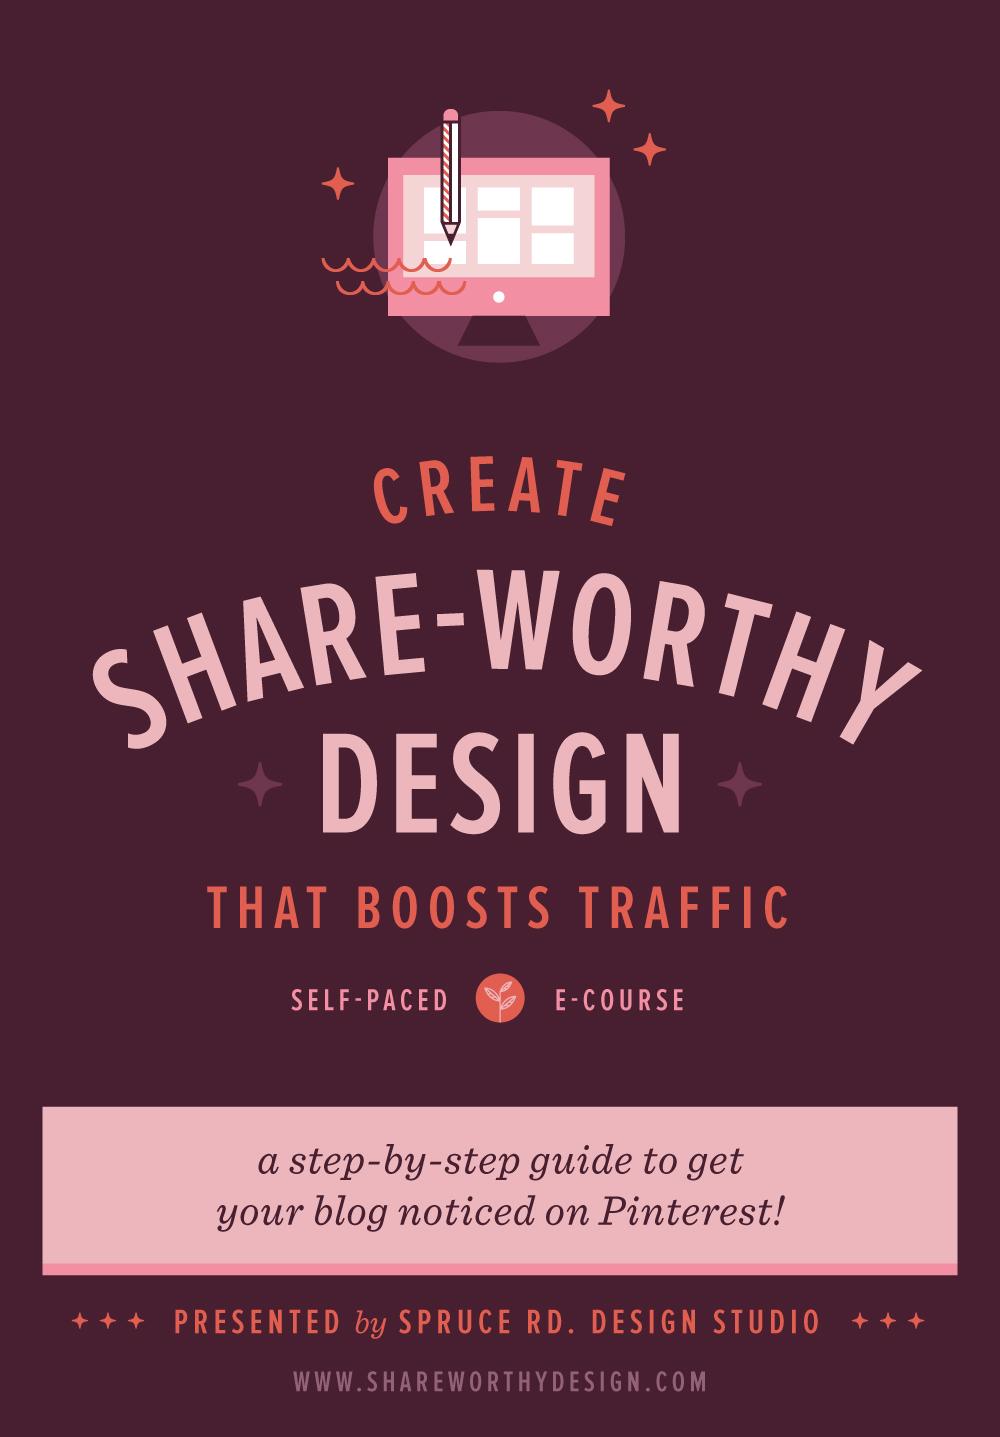 Create Share-worthy Design E-course | Spruce Rd.